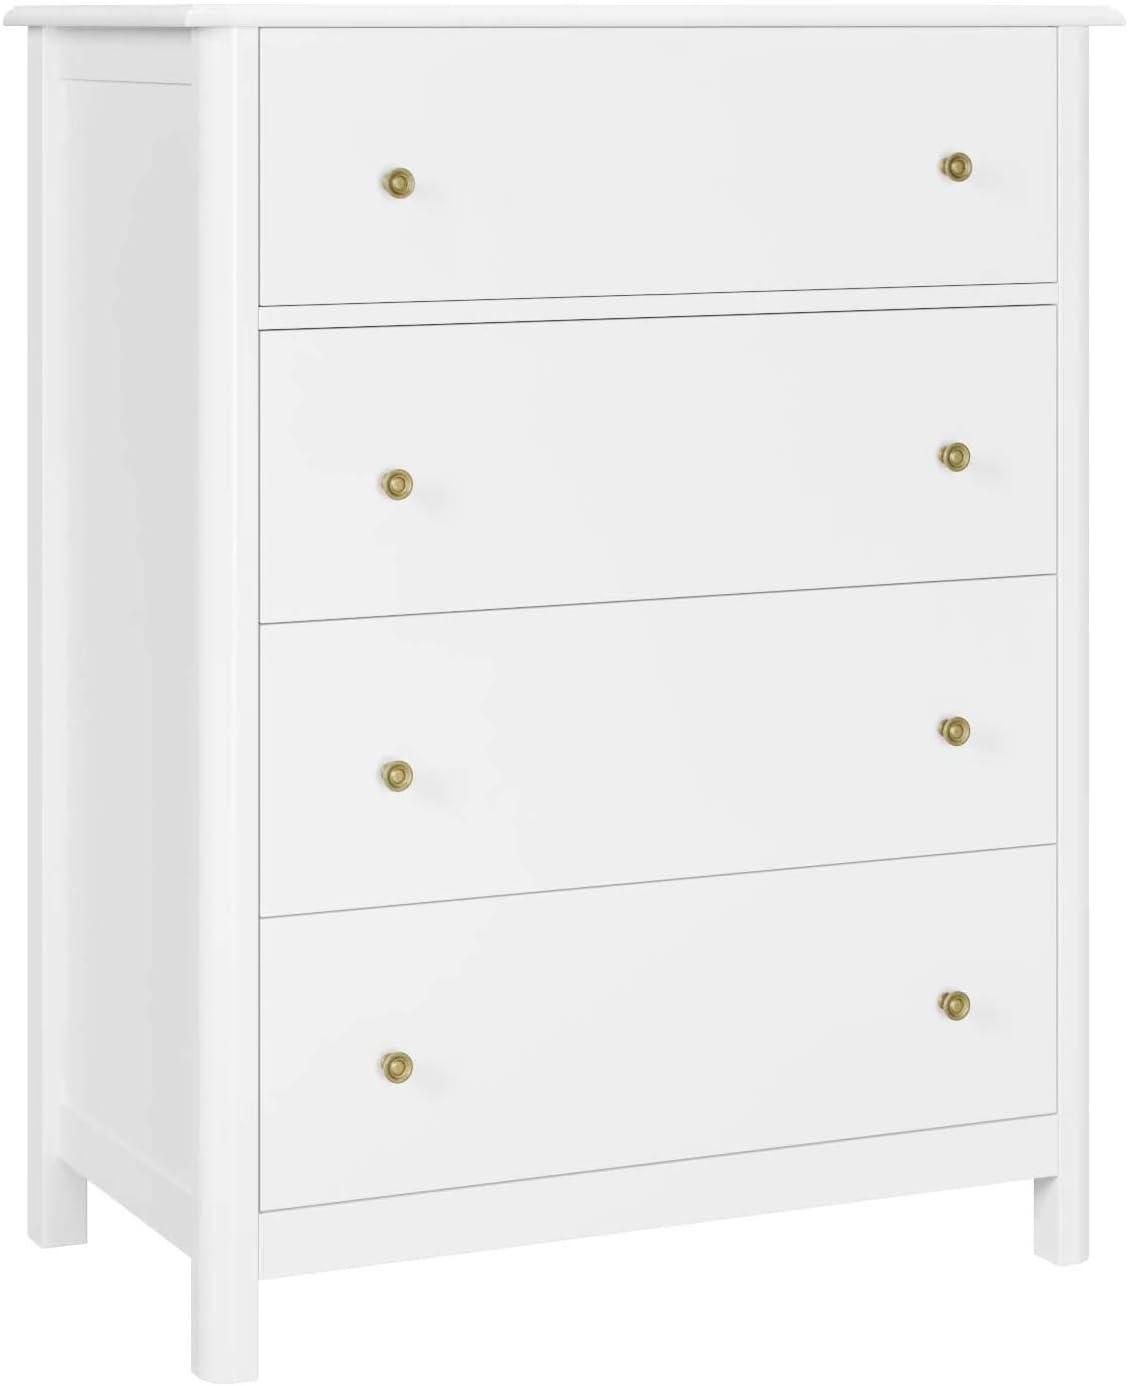 HOMECHO White Dresser 4 Drawer Chest/Nightstand - 29